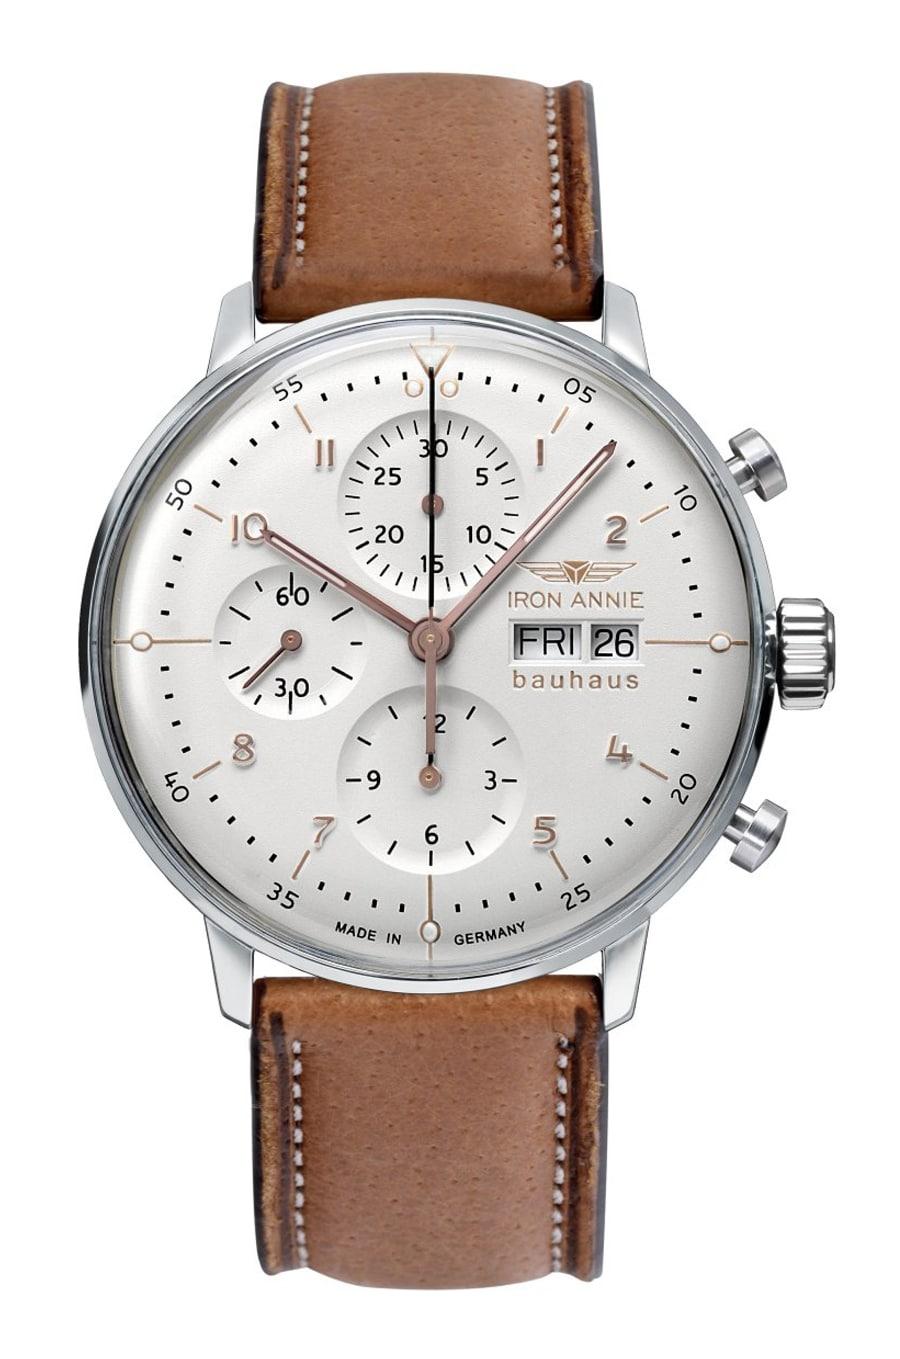 Iron Annie: Bauhaus Chronograph Automatik